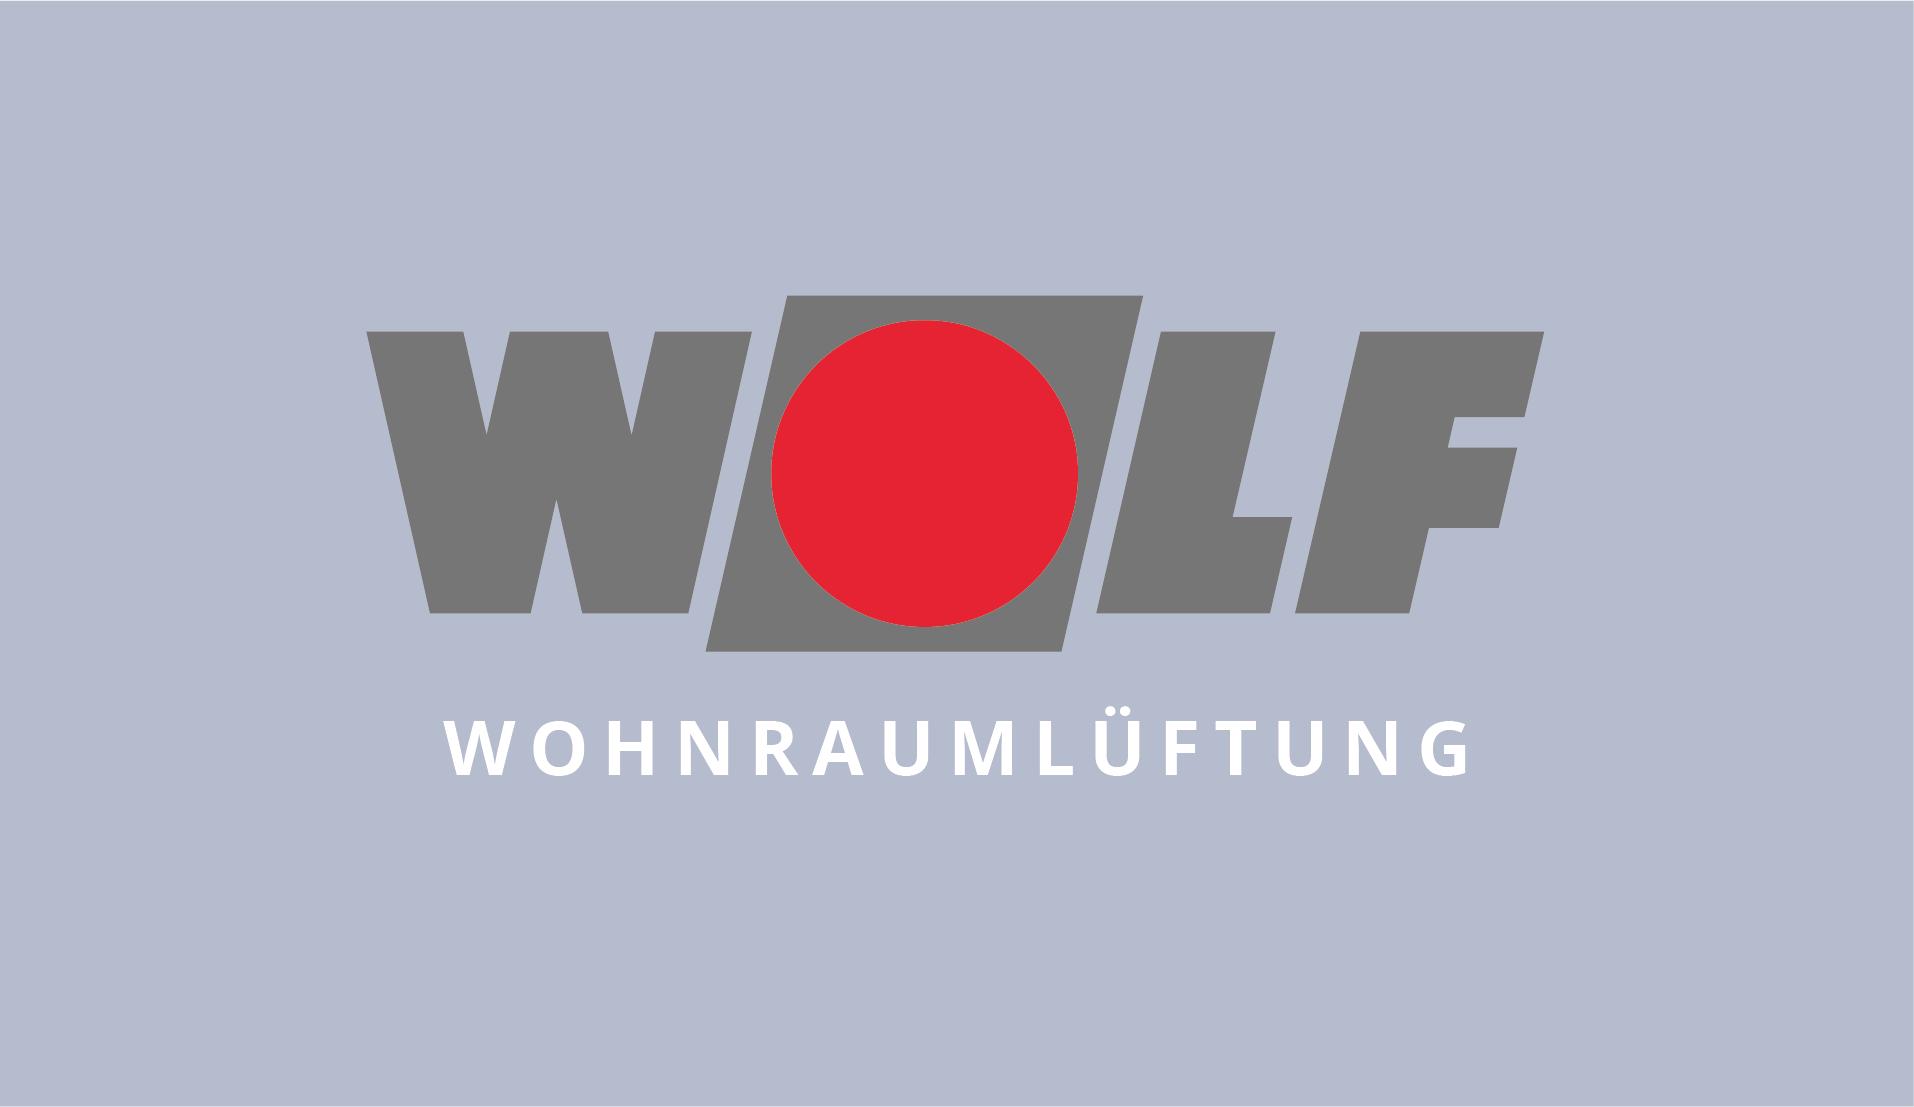 Logo WOLF Wohnraumlüftung